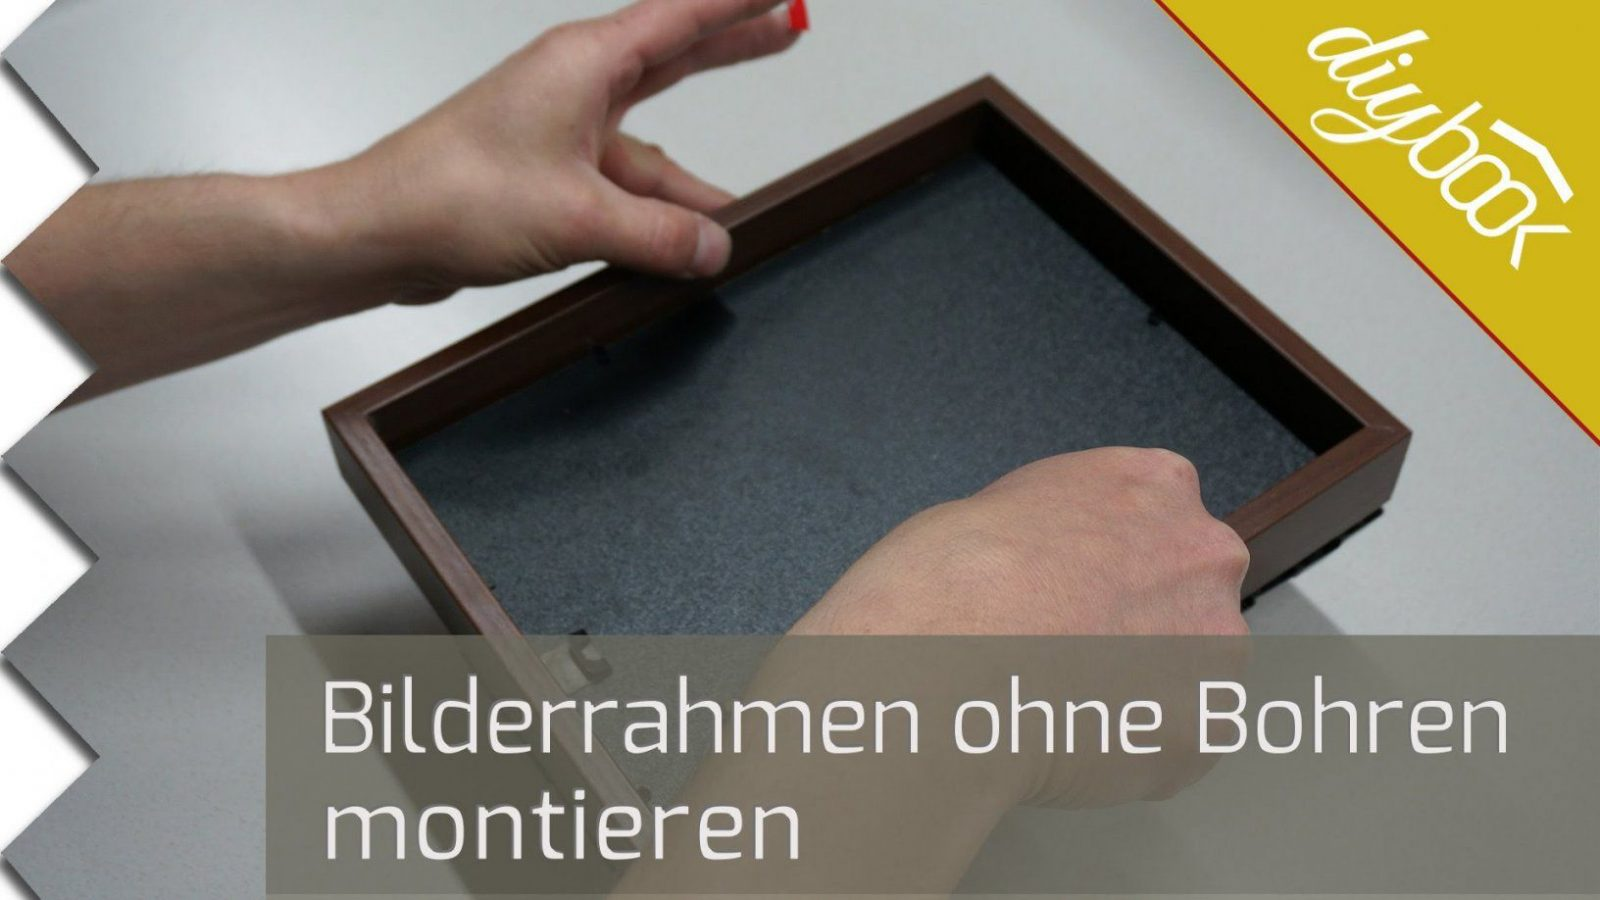 Bilderrahmen Ohne Bohren Aufhängen  Youtube von Ikea Bilderrahmen Ribba Aufhängen Photo